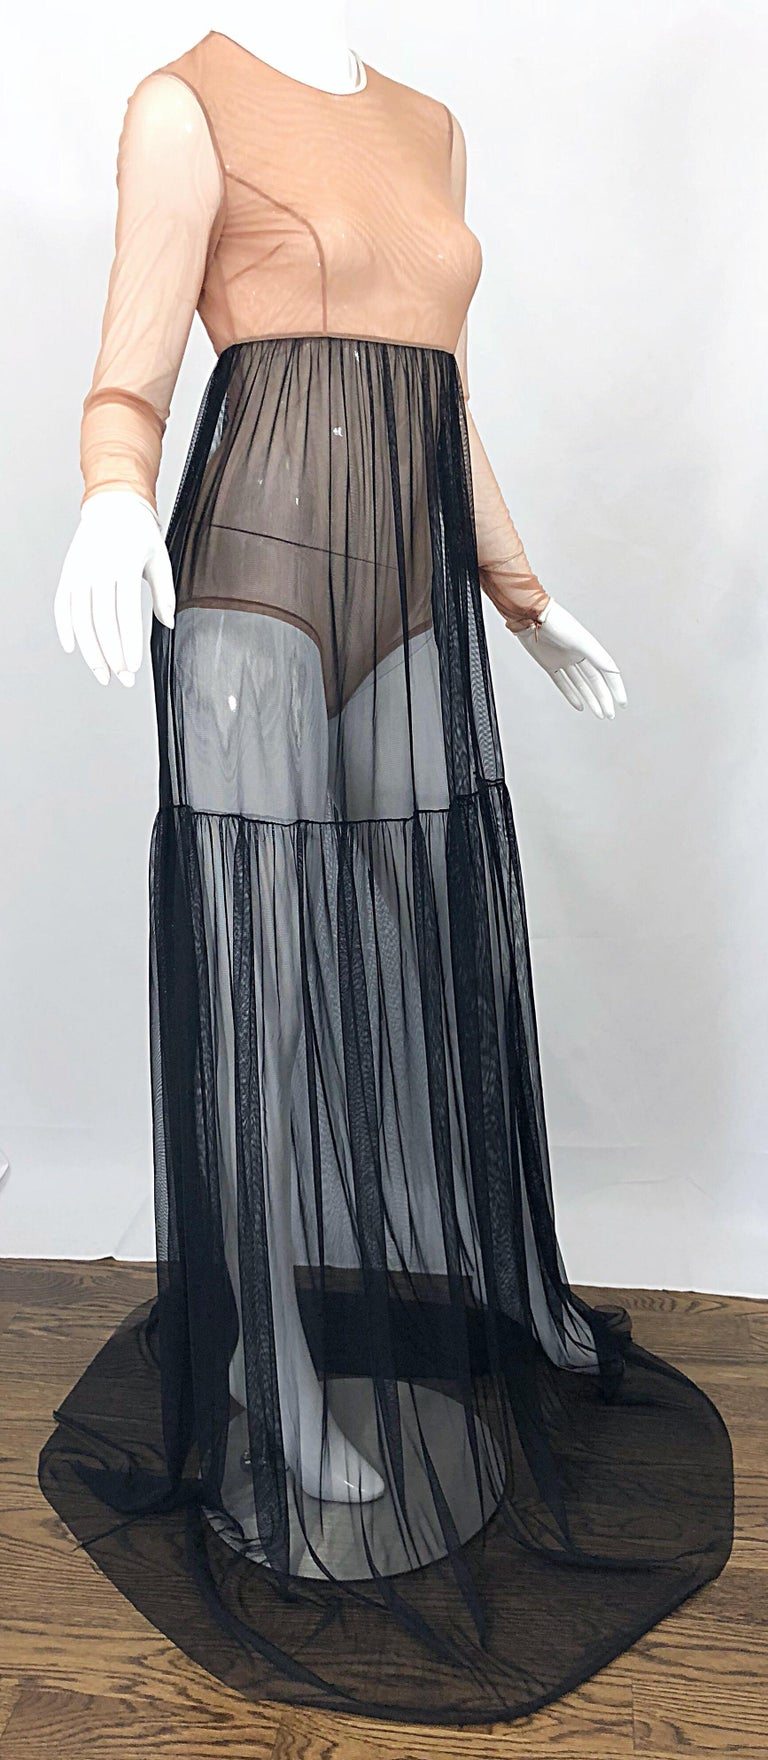 Michael Kors Collection Sz 4 Nude + Black Sheer Runway Mesh Bodysuit Gown Dress For Sale 2